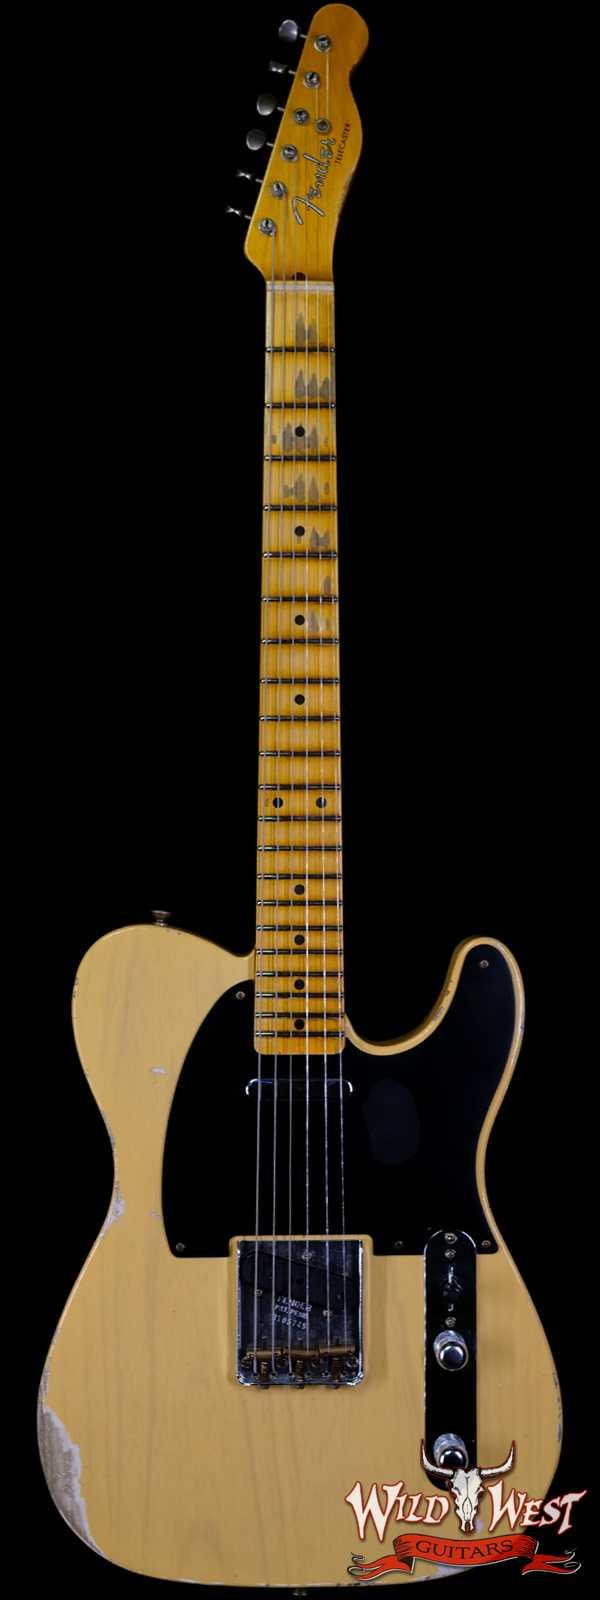 Fender Custom Shop 1952 Telecaster Relic Ash Body Maple Neck Nocaster Blonde 7.05 LBS